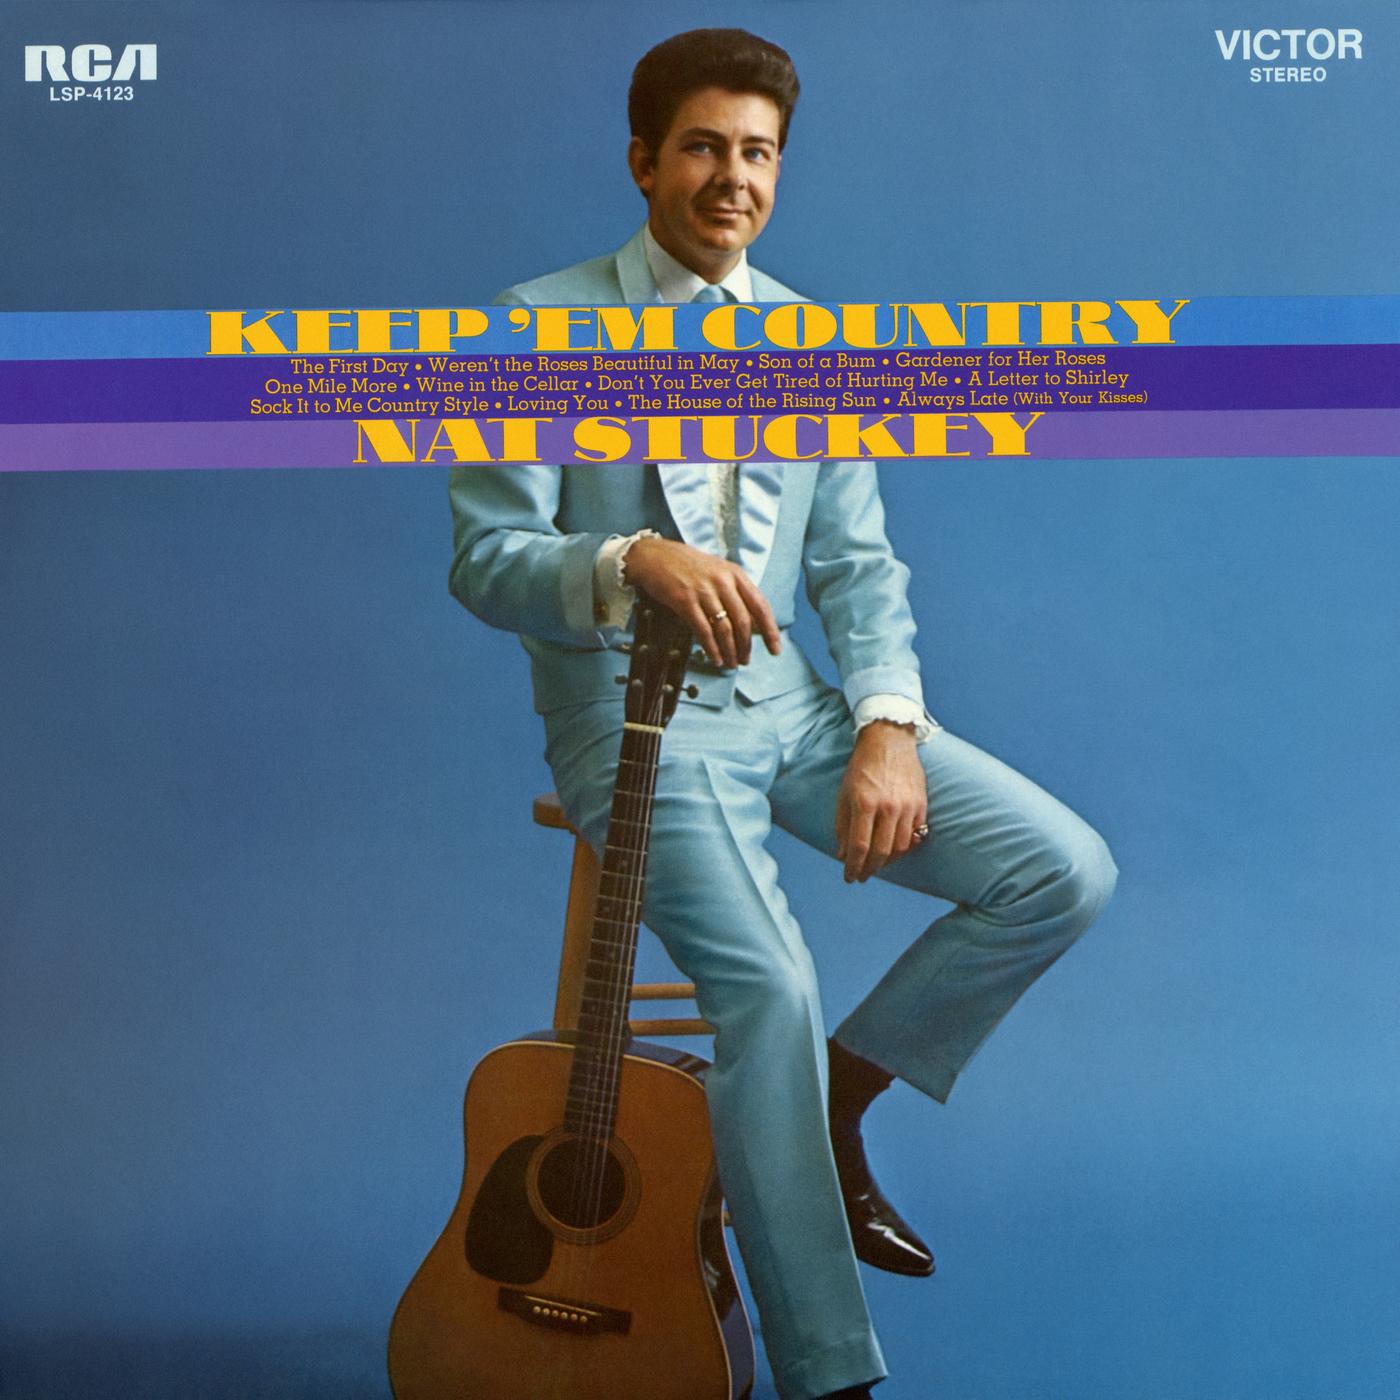 Keep 'Em Country - Nat Stuckey